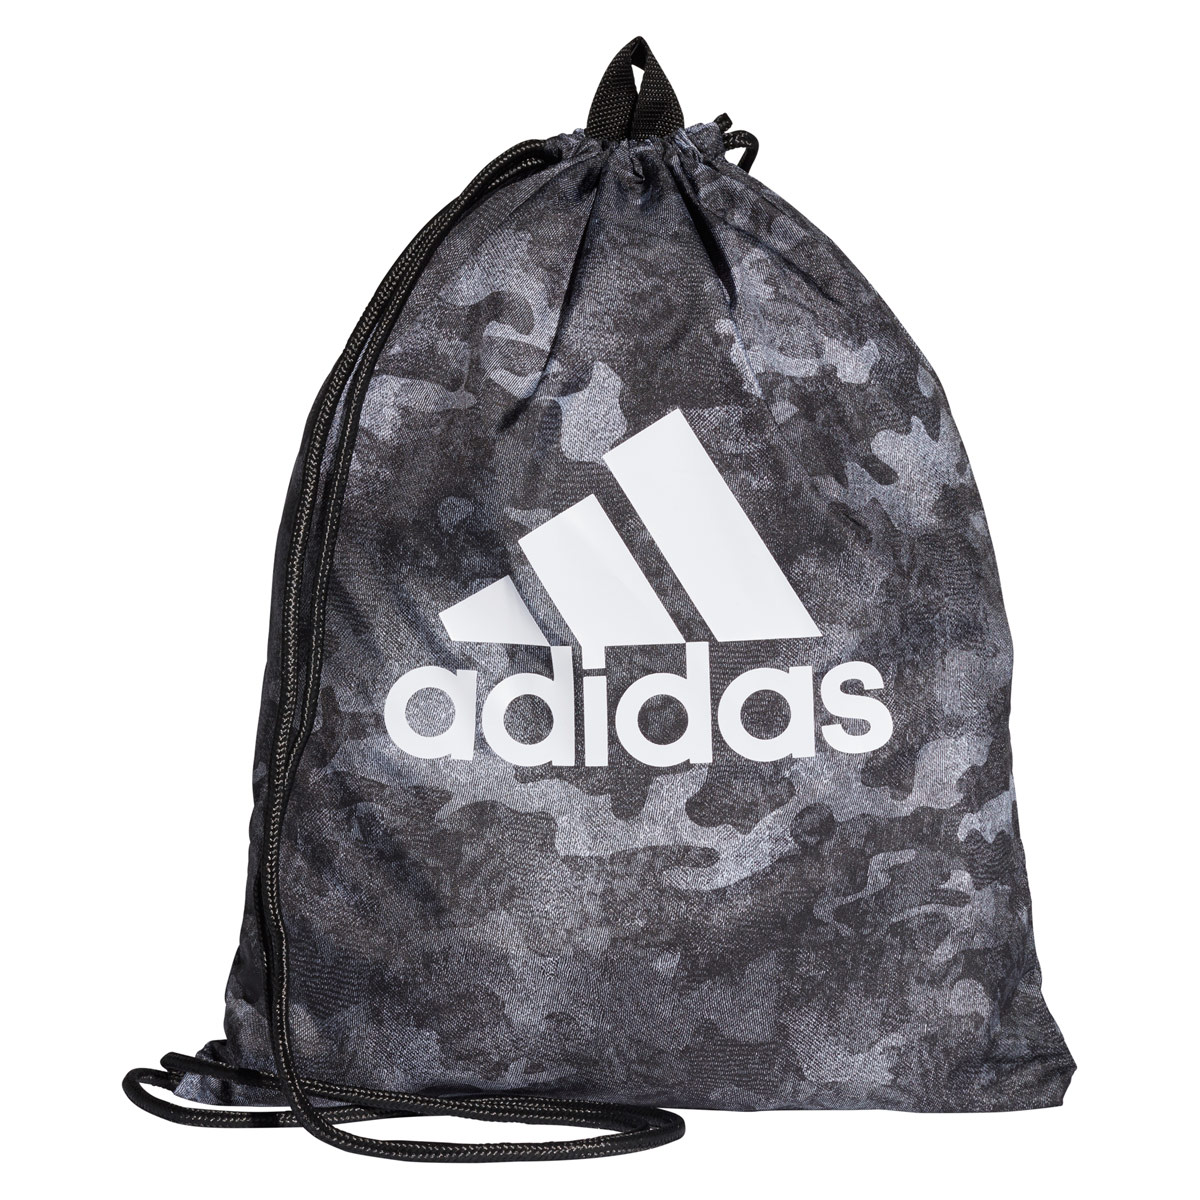 701bf7461a918 adidas Sports Sportbeutel - Bags - Black